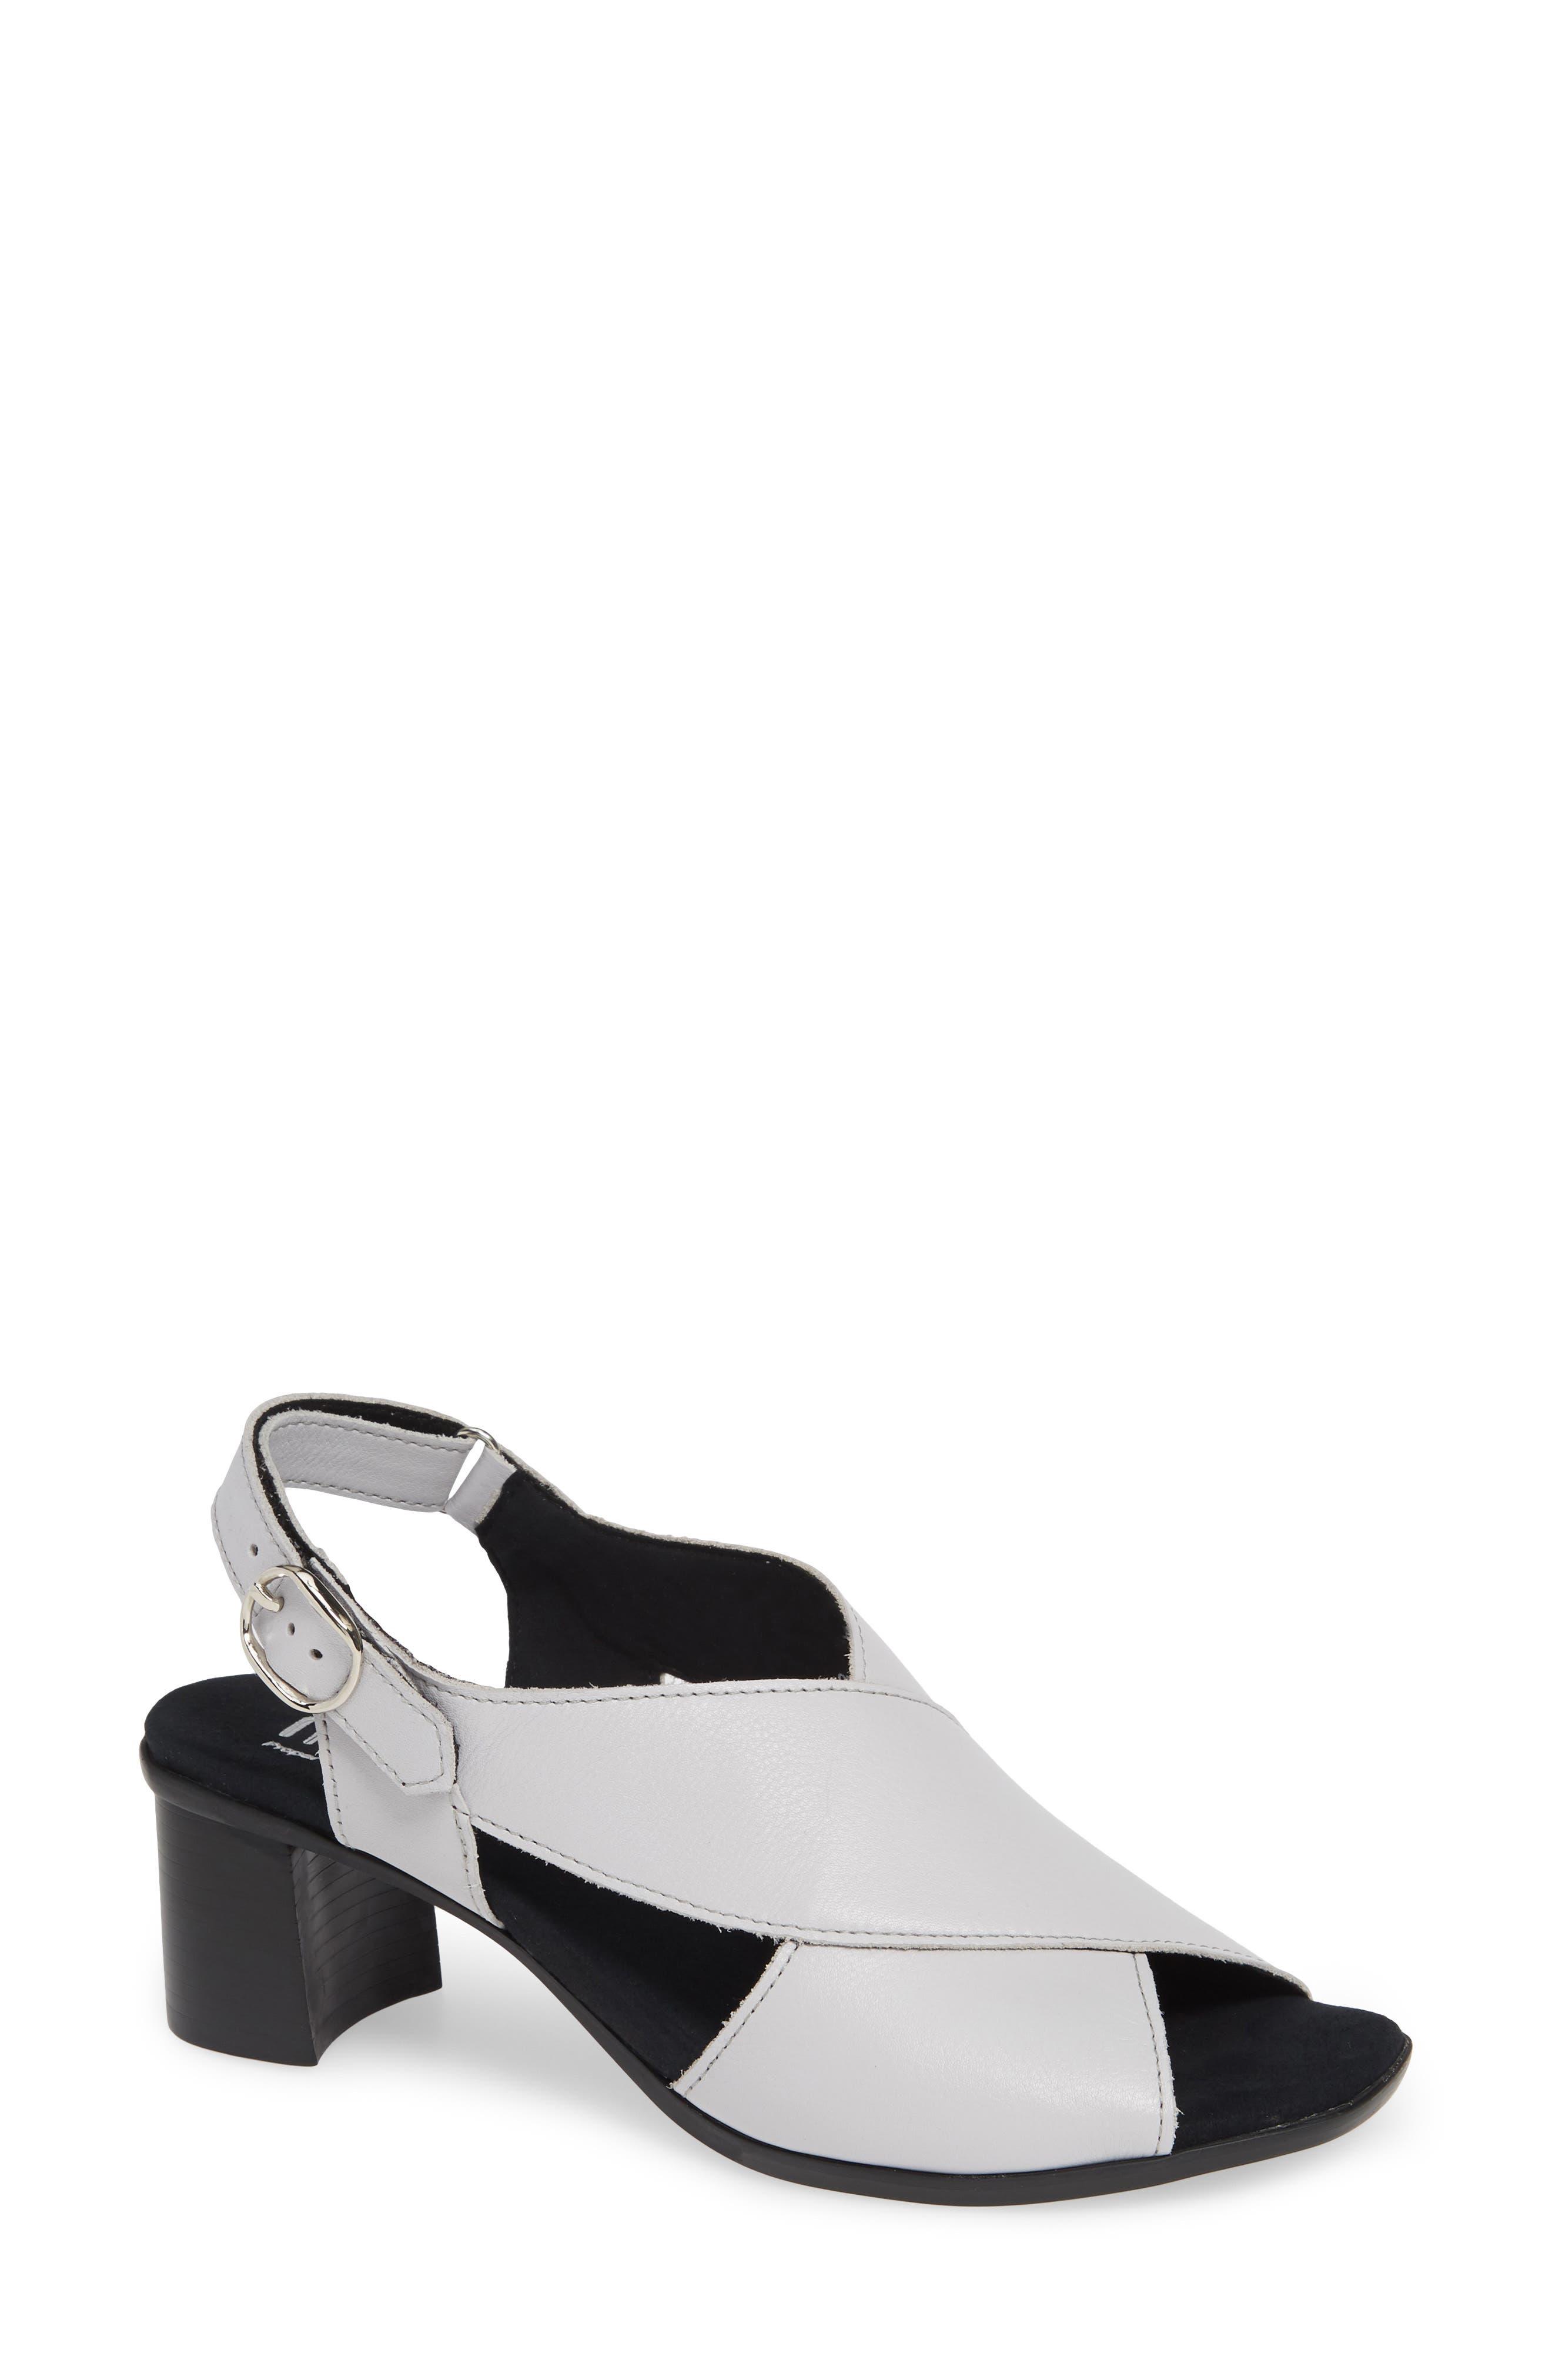 Laine Block Heel Sandal,                             Main thumbnail 1, color,                             WHITE LEATHER